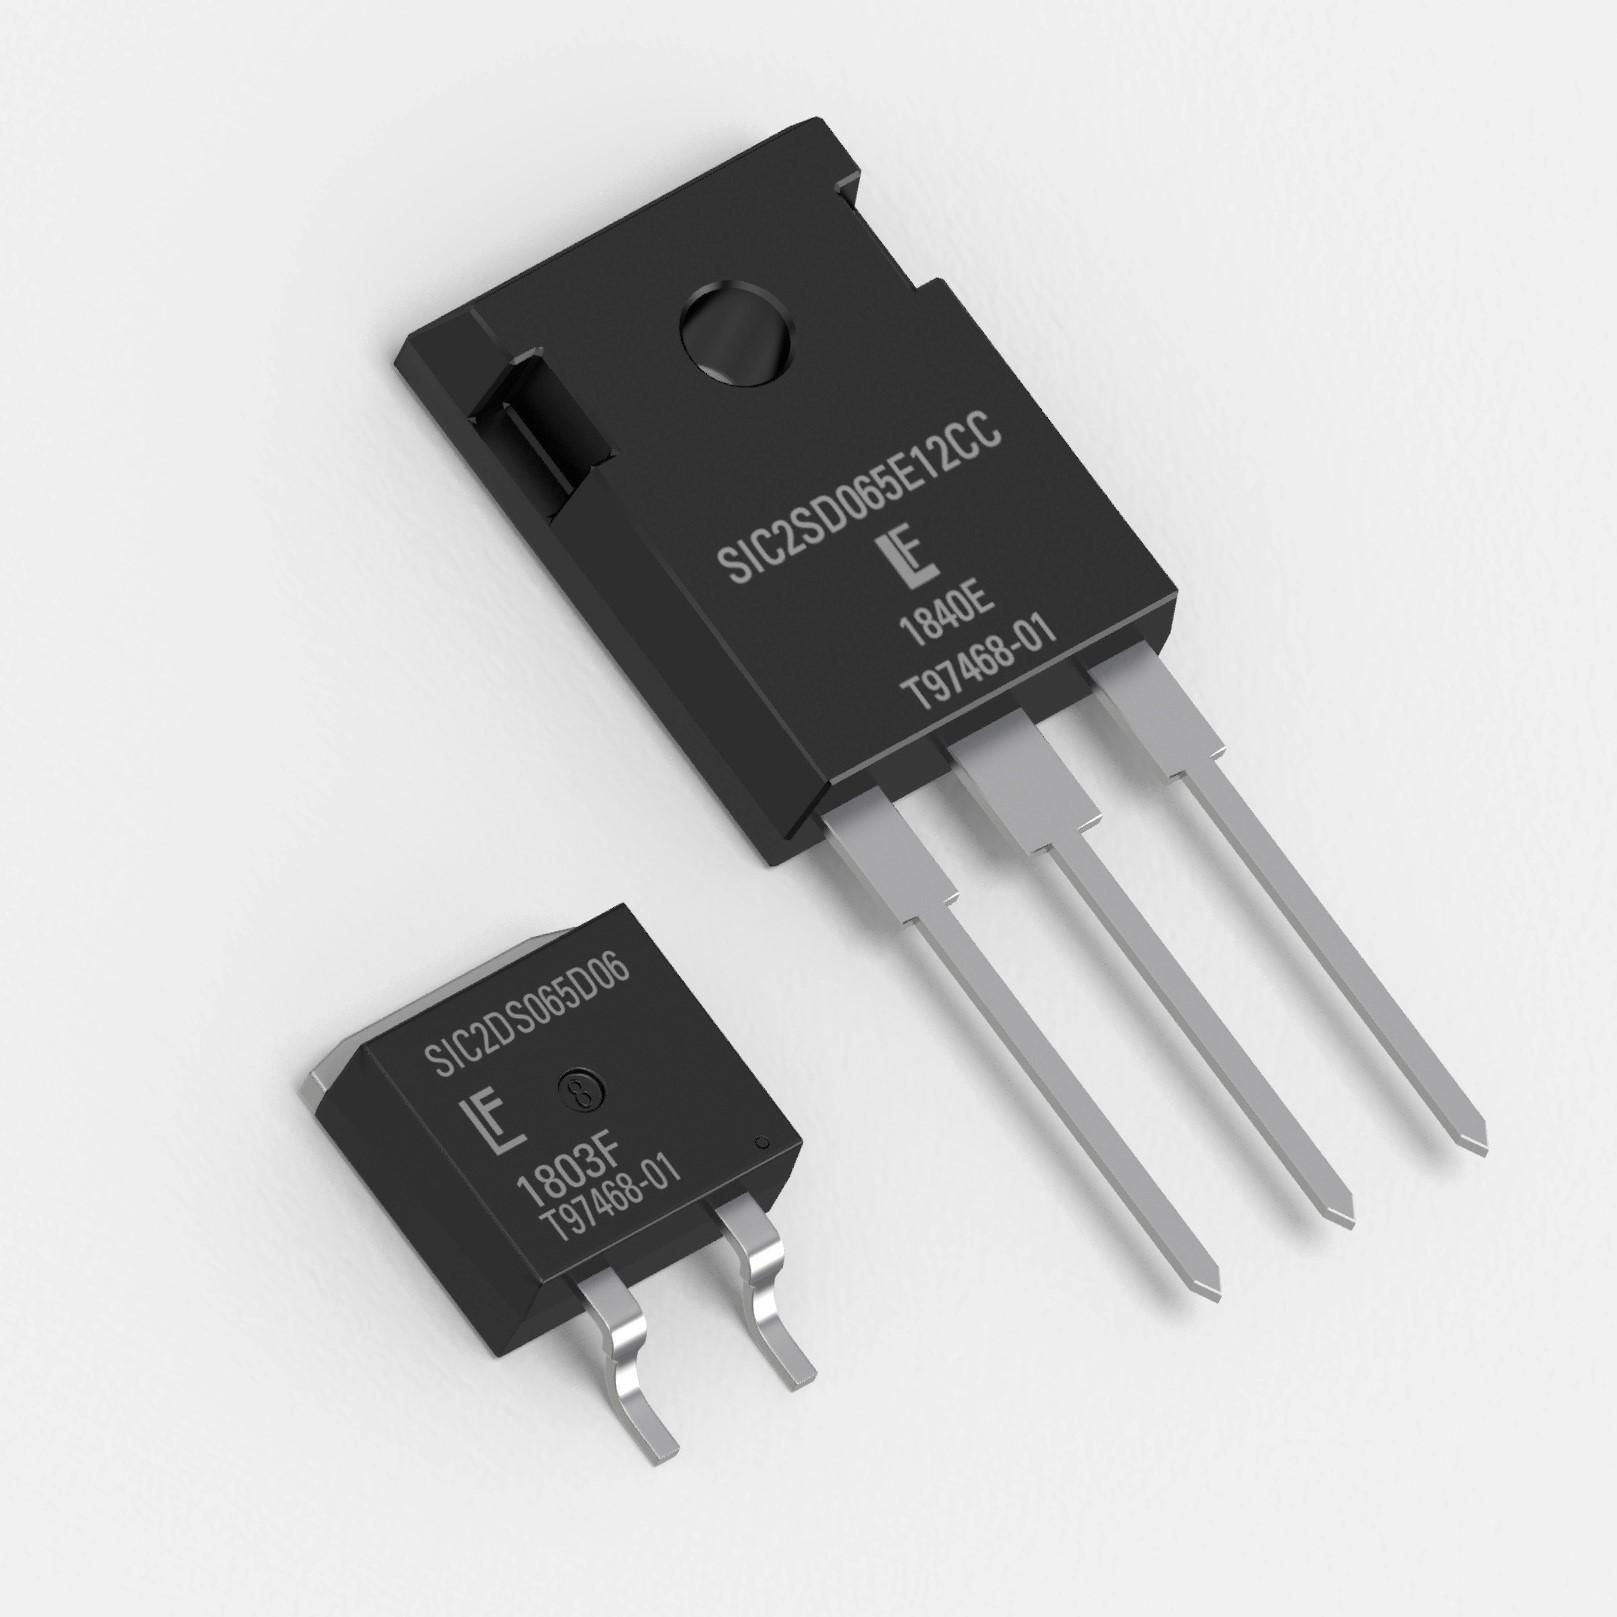 Littelfuse将于2019年APEC大会上推出650V碳化硅肖特基二极管,该二极管提供新的封装尺寸以及6A至40A的额定电流